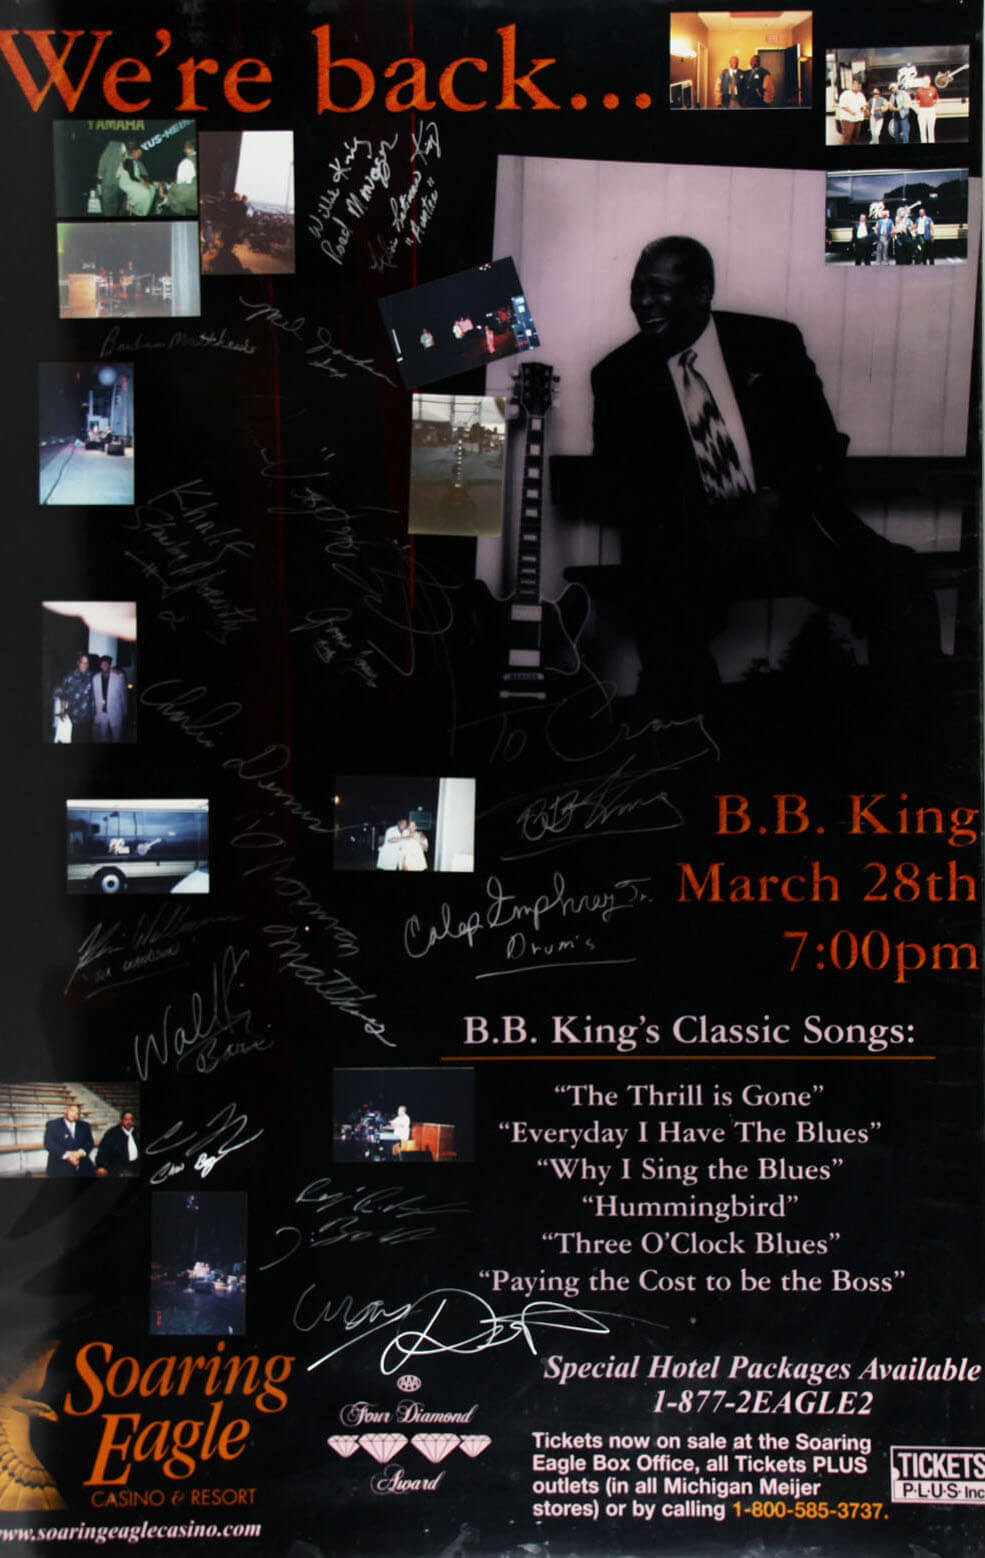 B.B. King & All Band Members/Crew Members Signed Poster - JSA